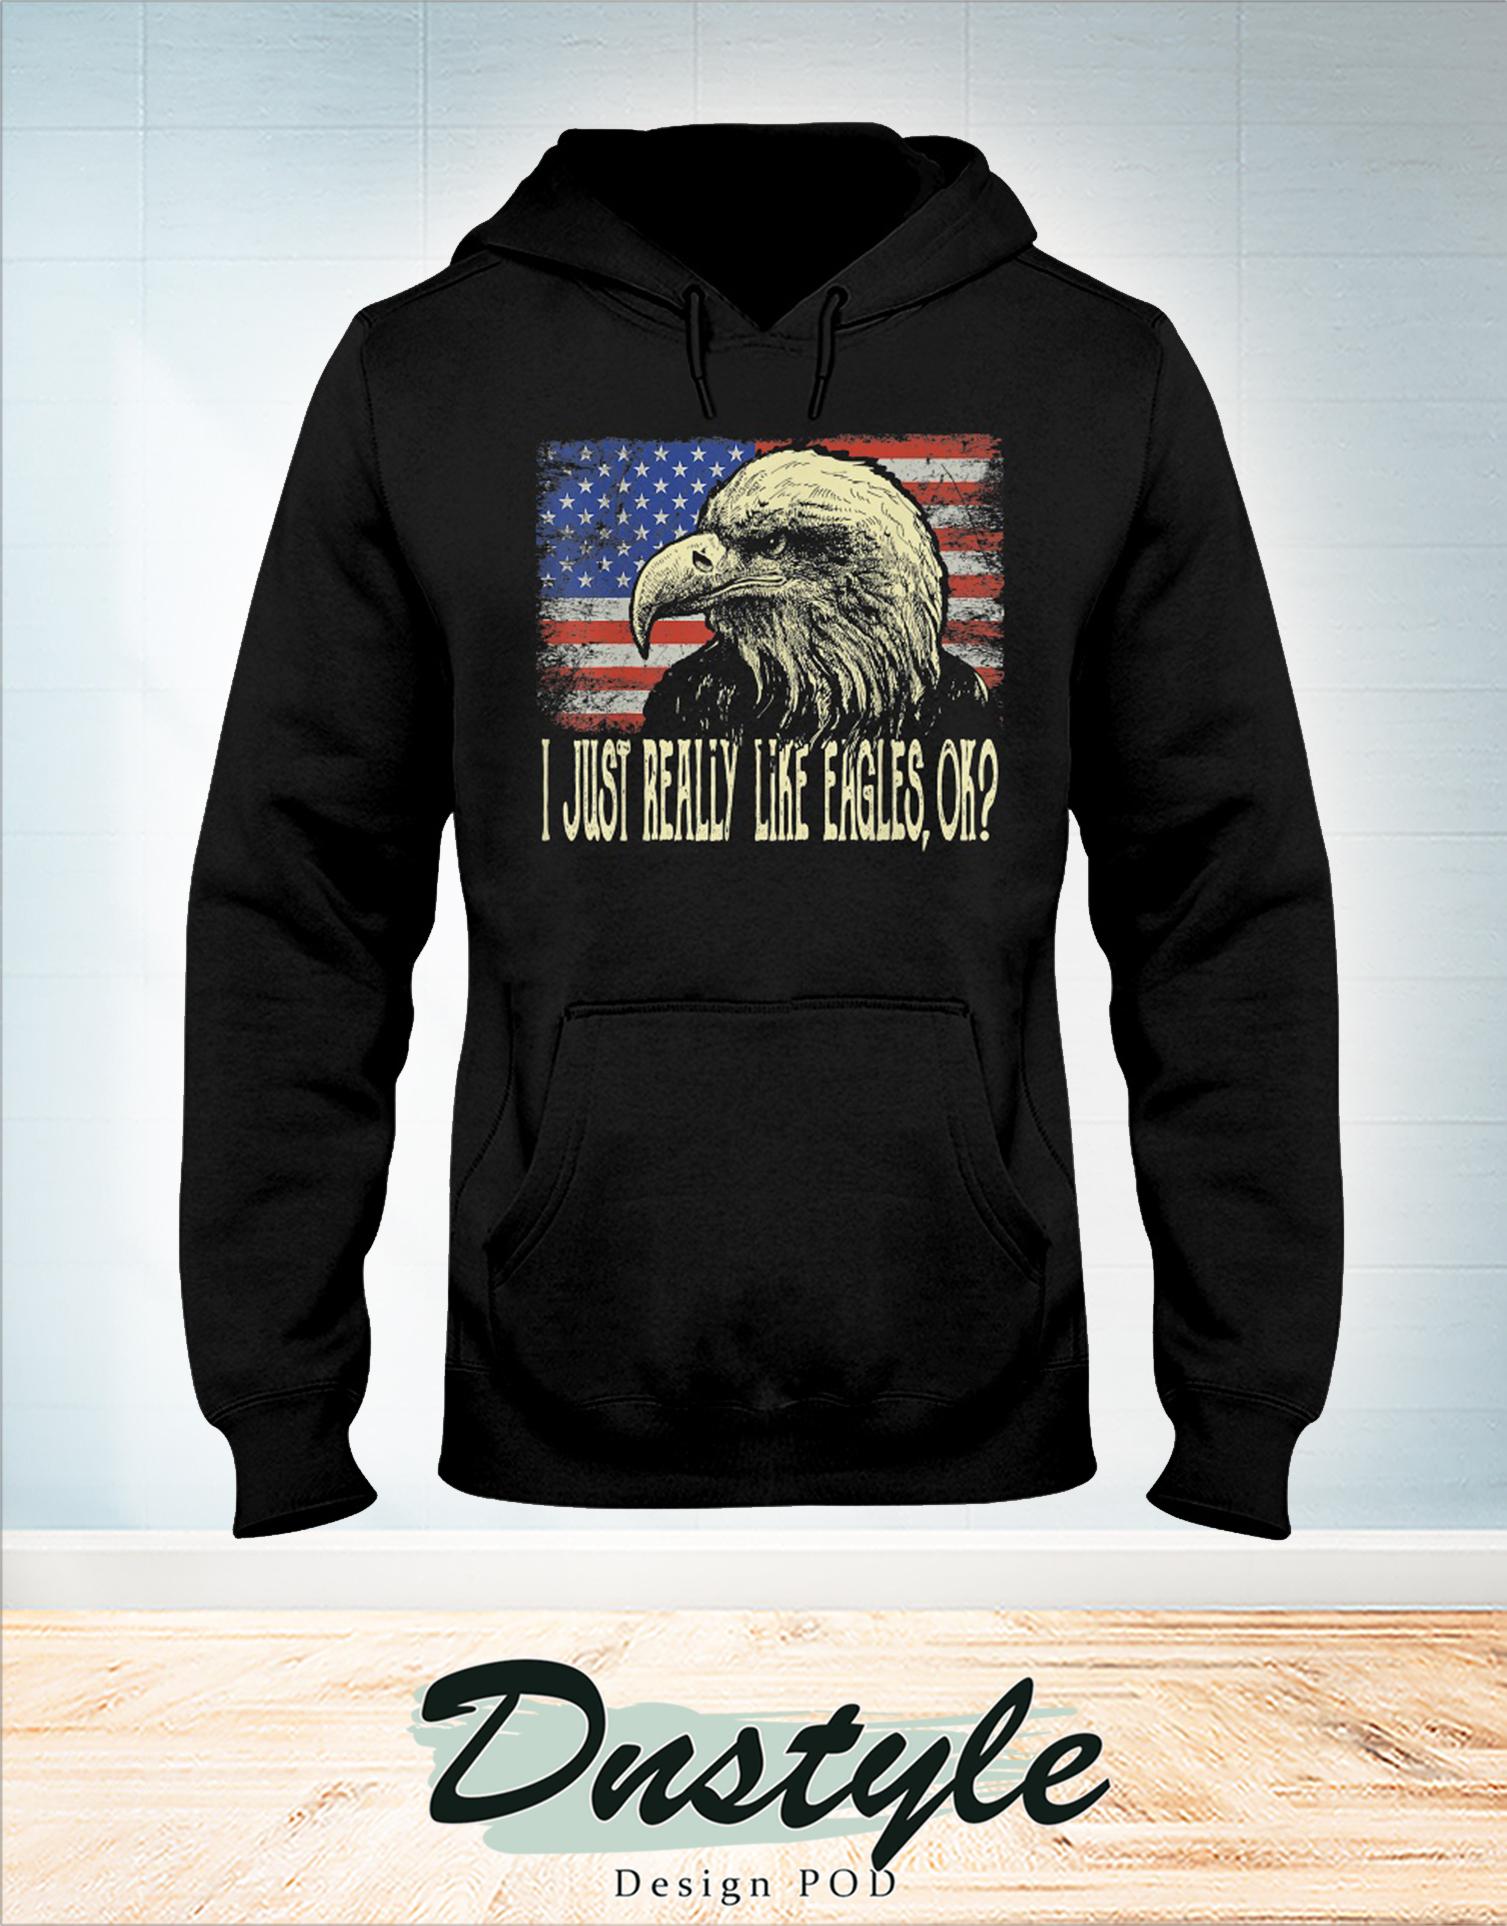 I just really like eagles ok 4th of july hoodie